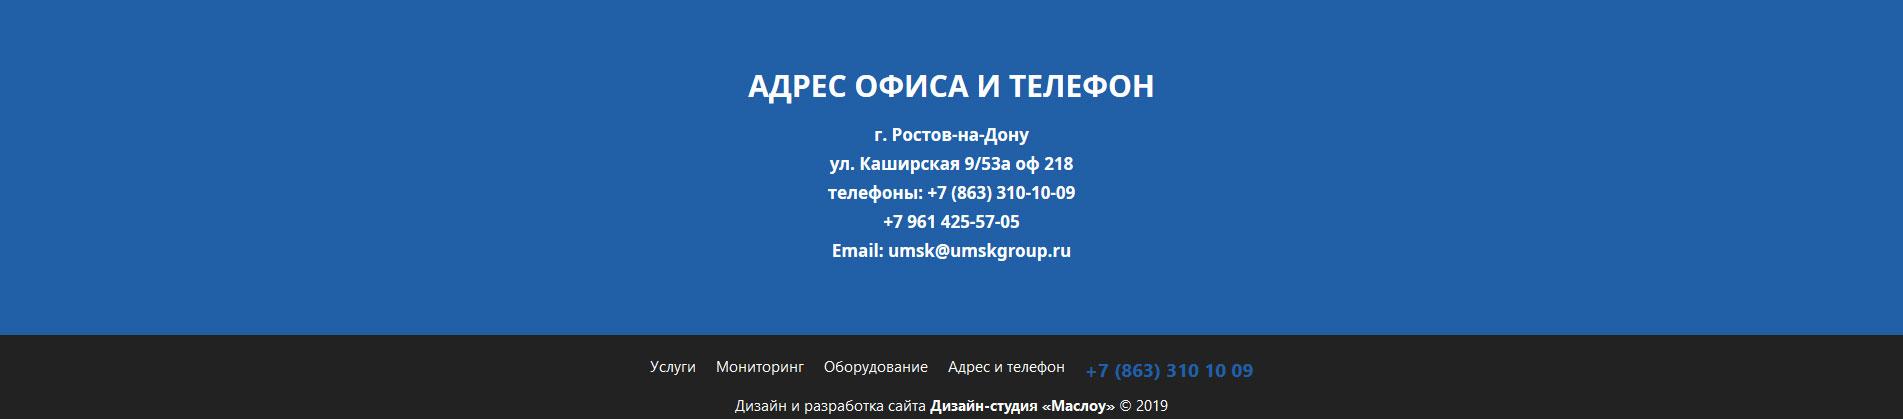 Сайт ЮМСК